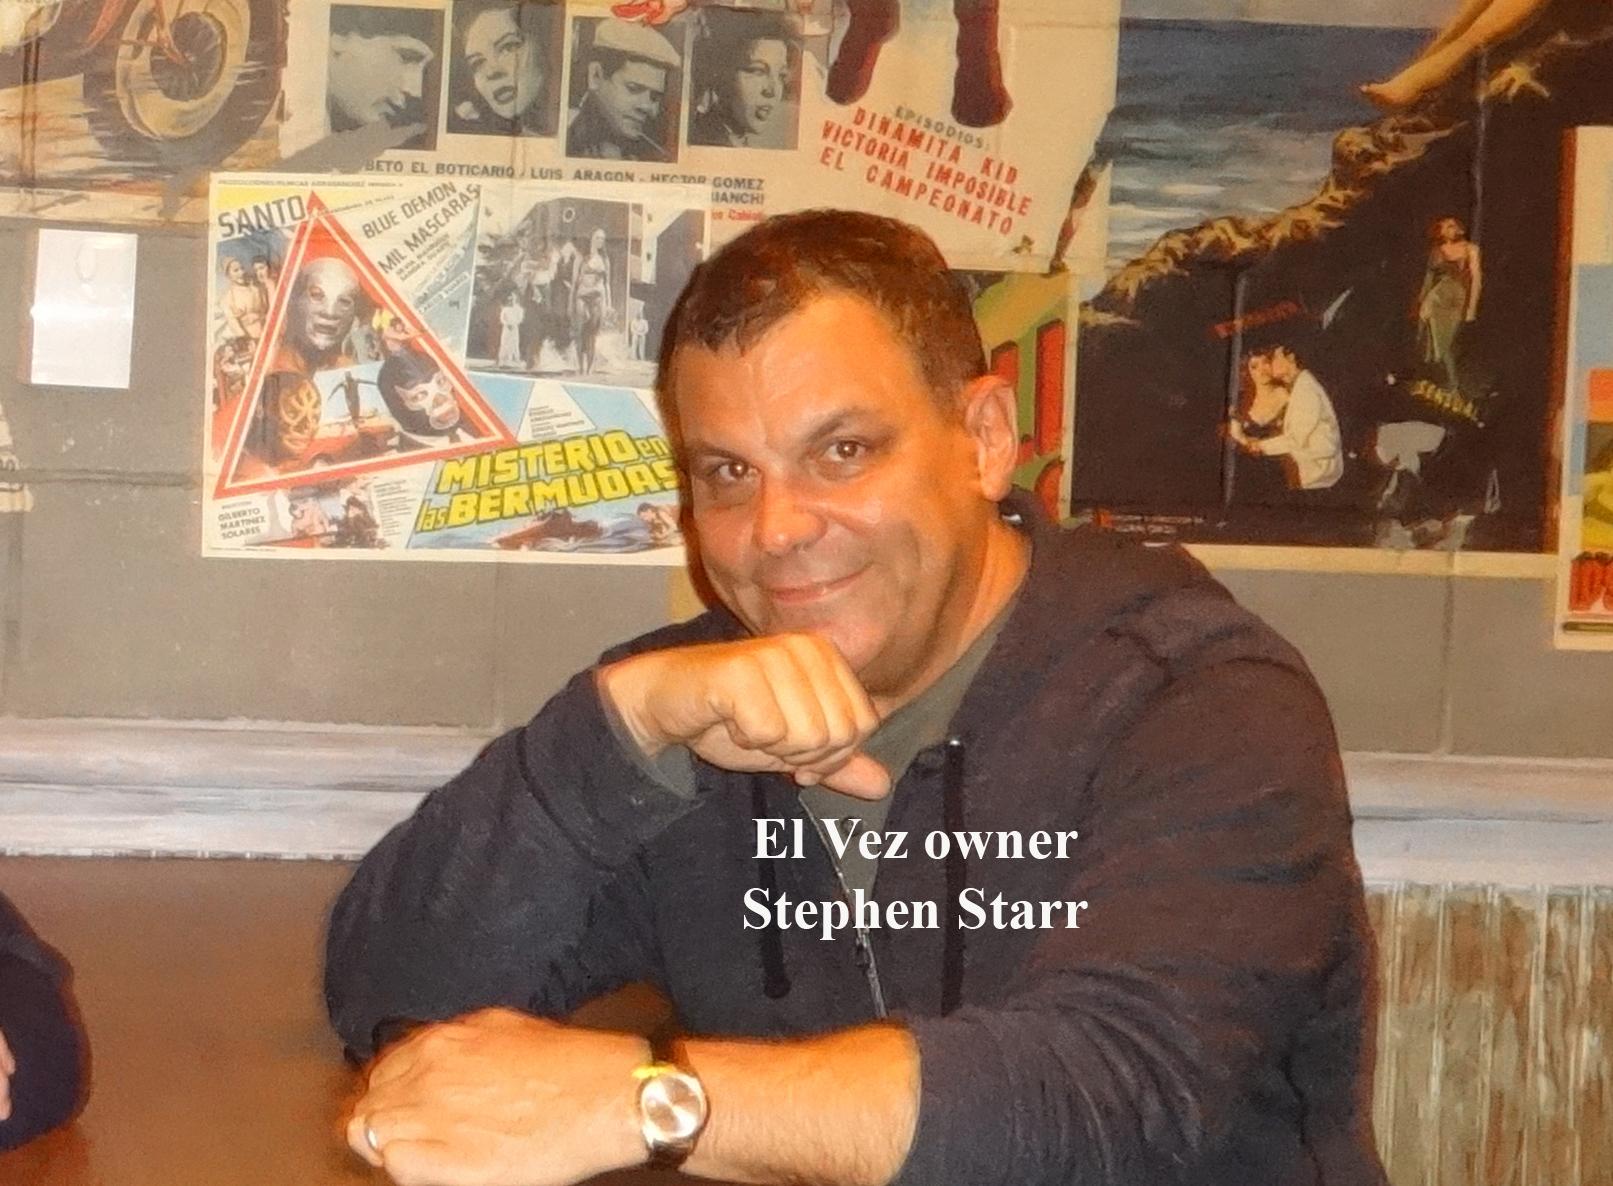 Stephen Starr